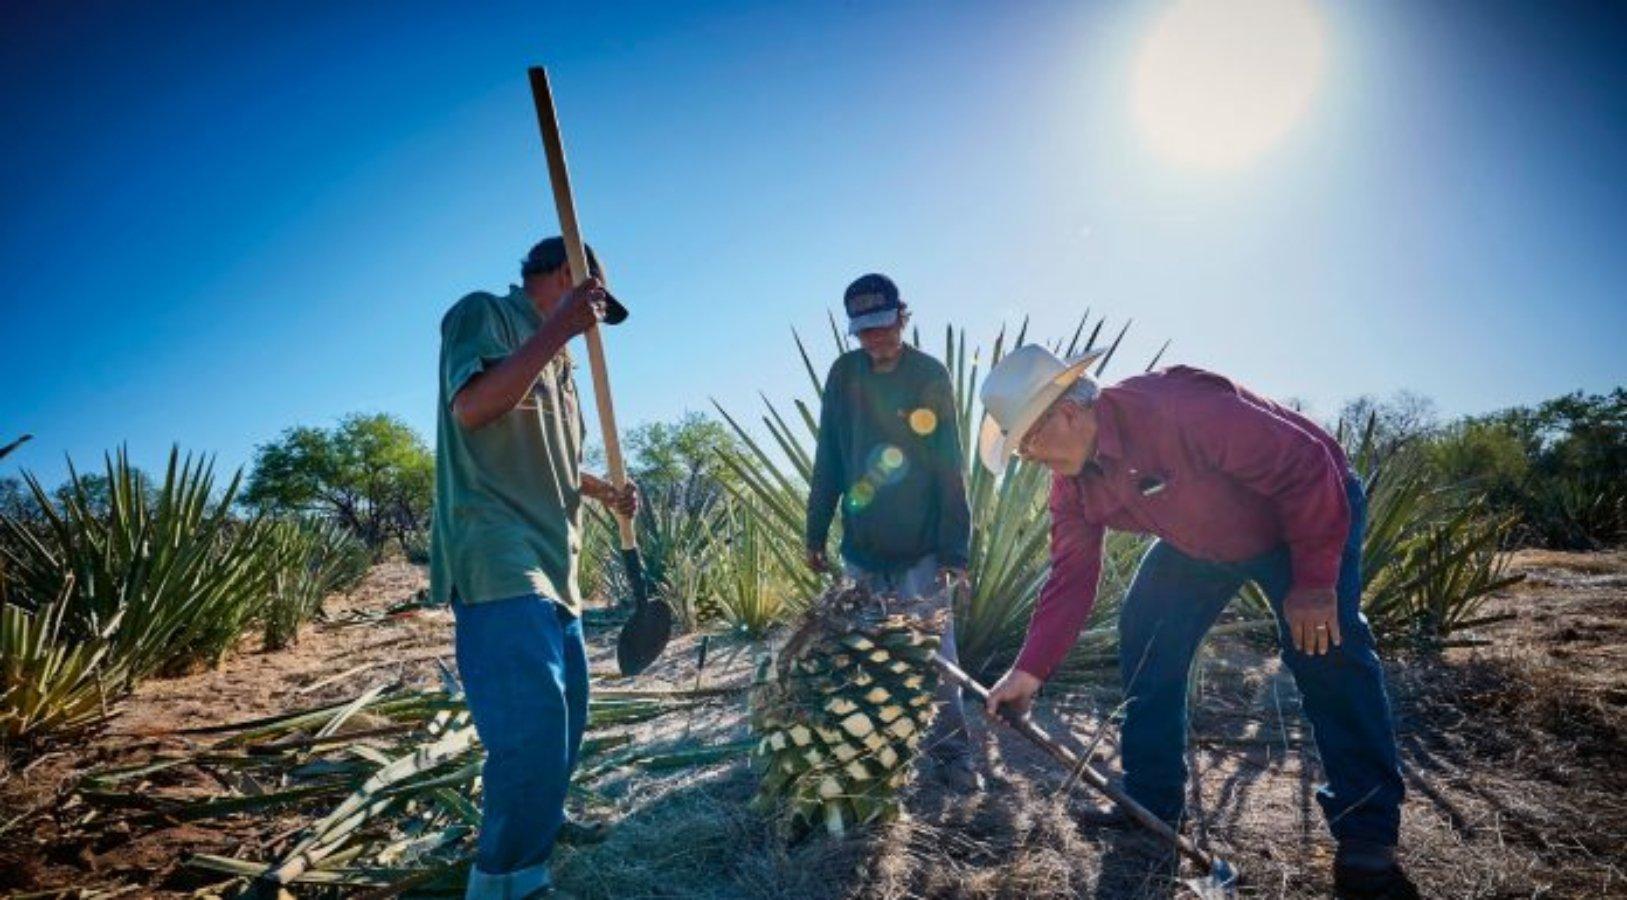 Tres hombres cortando agave gigante